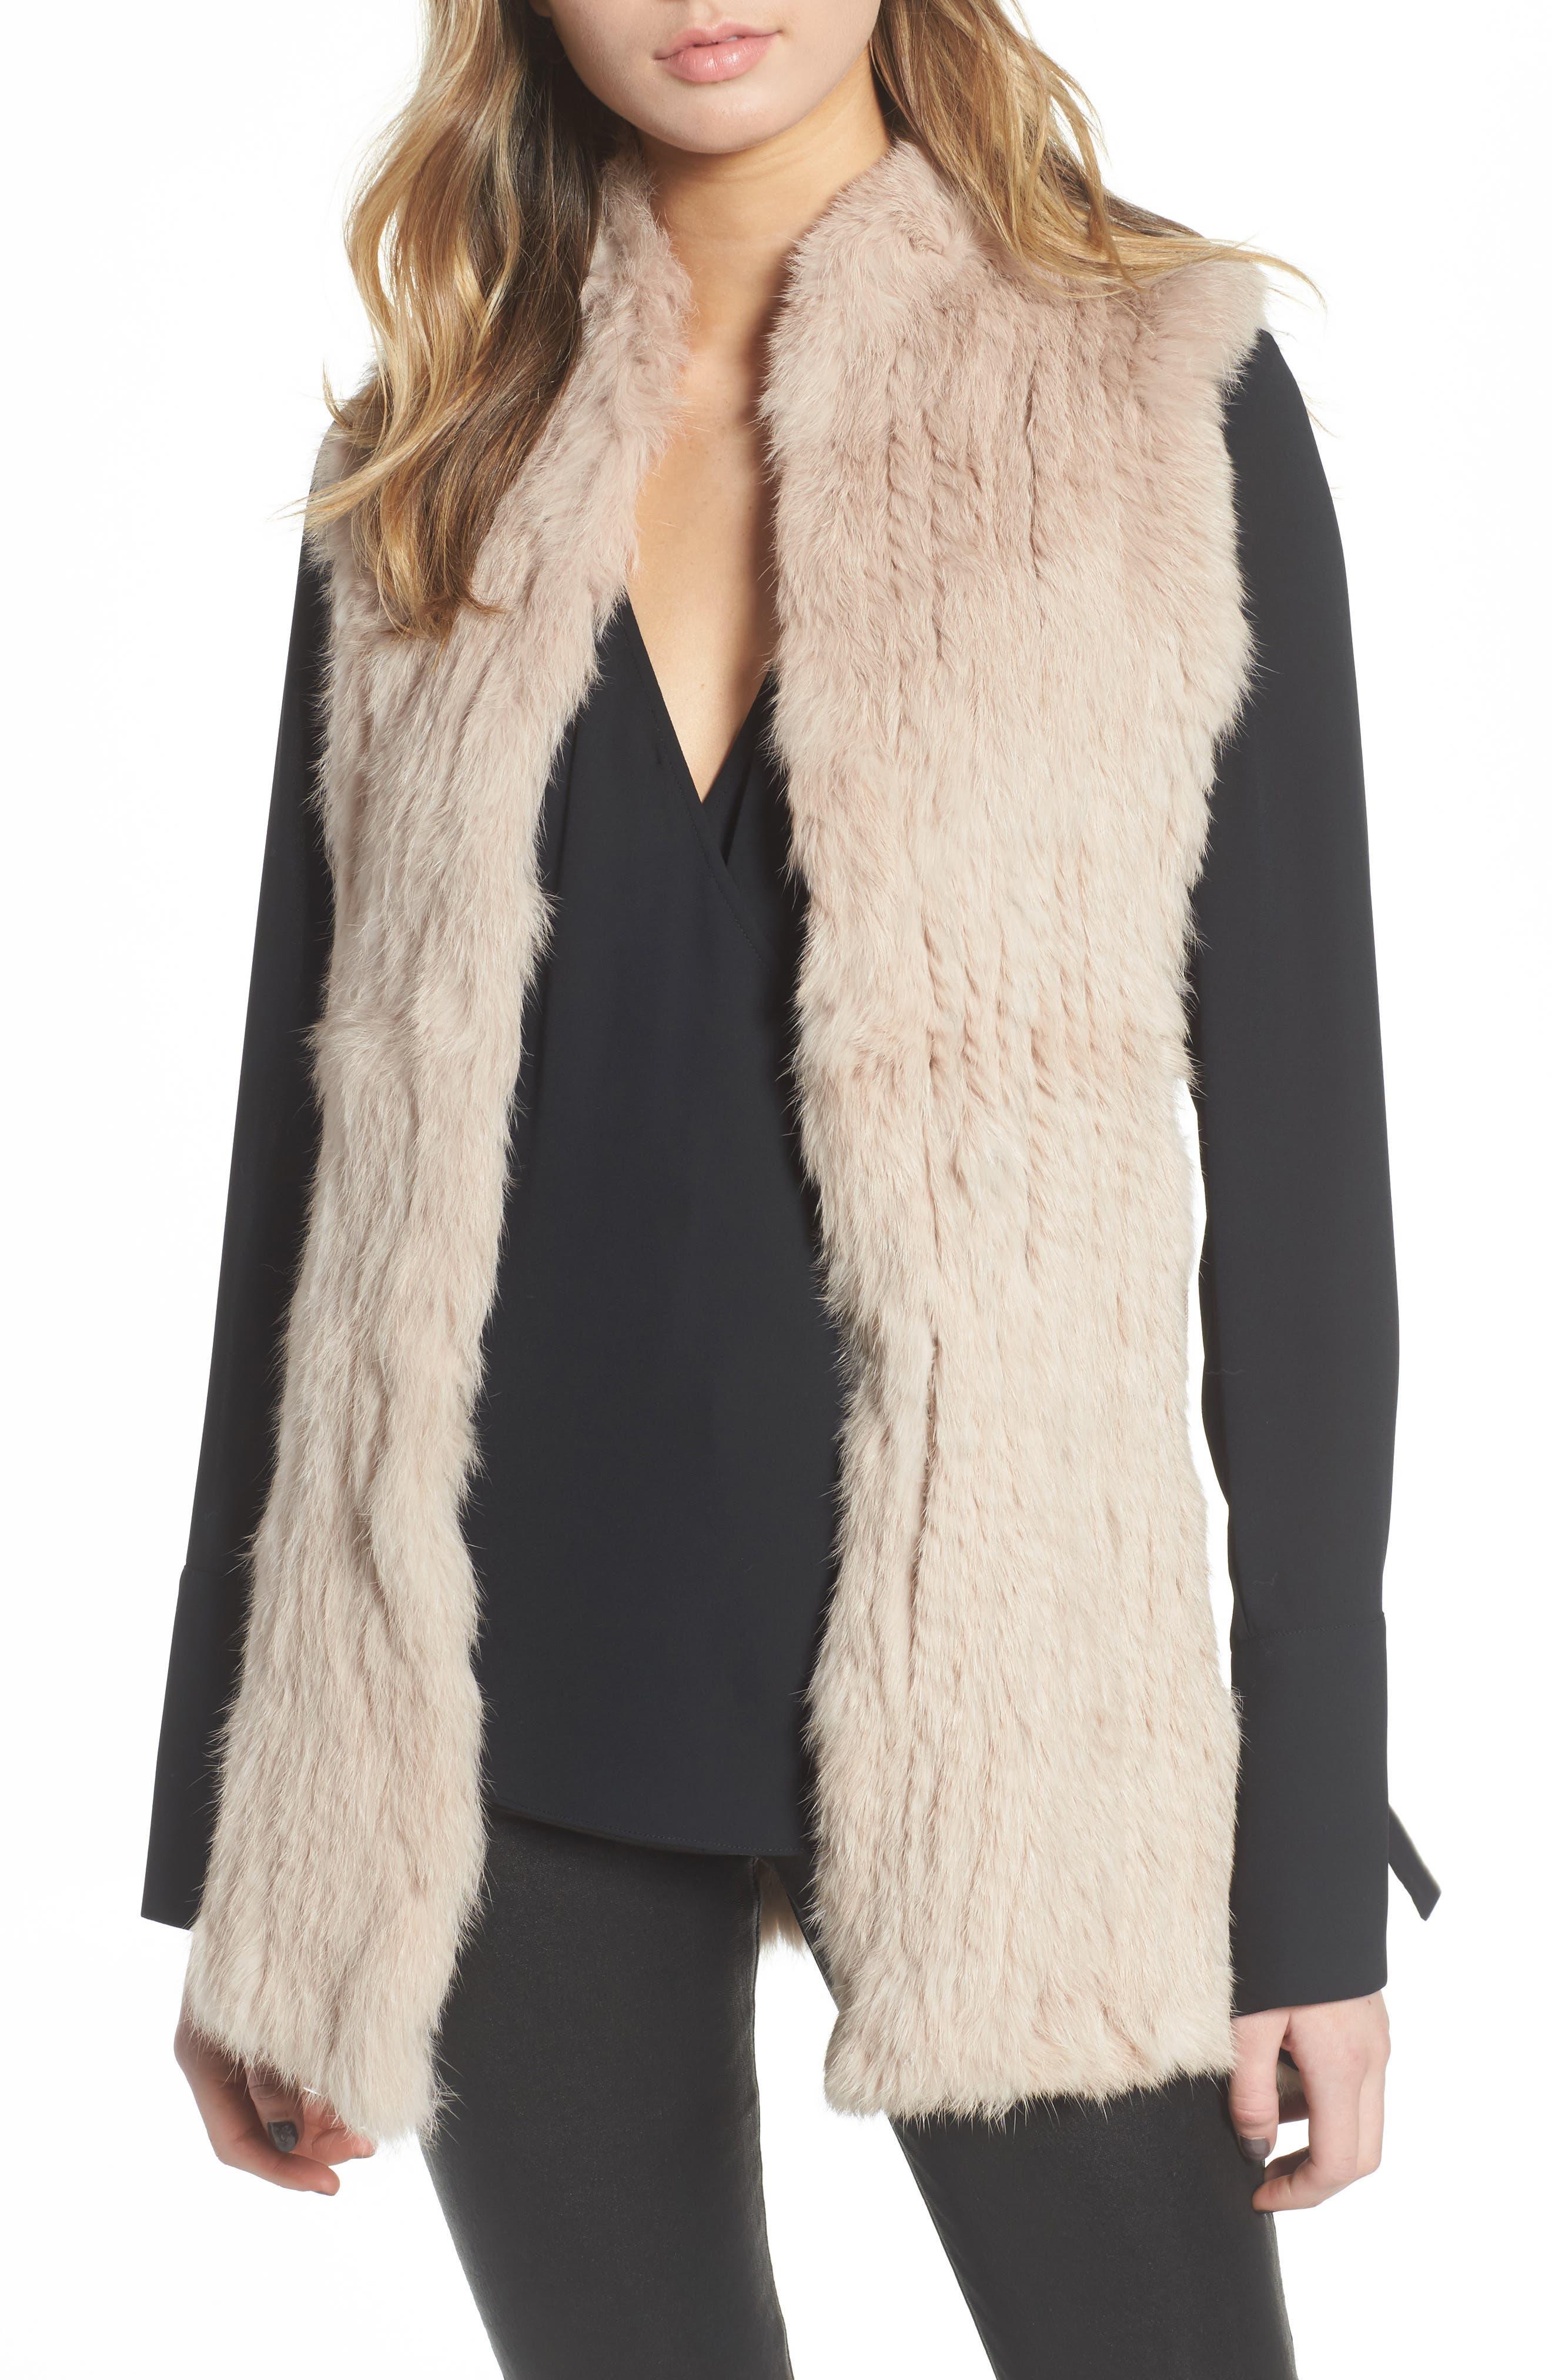 Main Image - Love Token Genuine Rabbit Fur & Knit Vest (Nordstrom Exclusive)